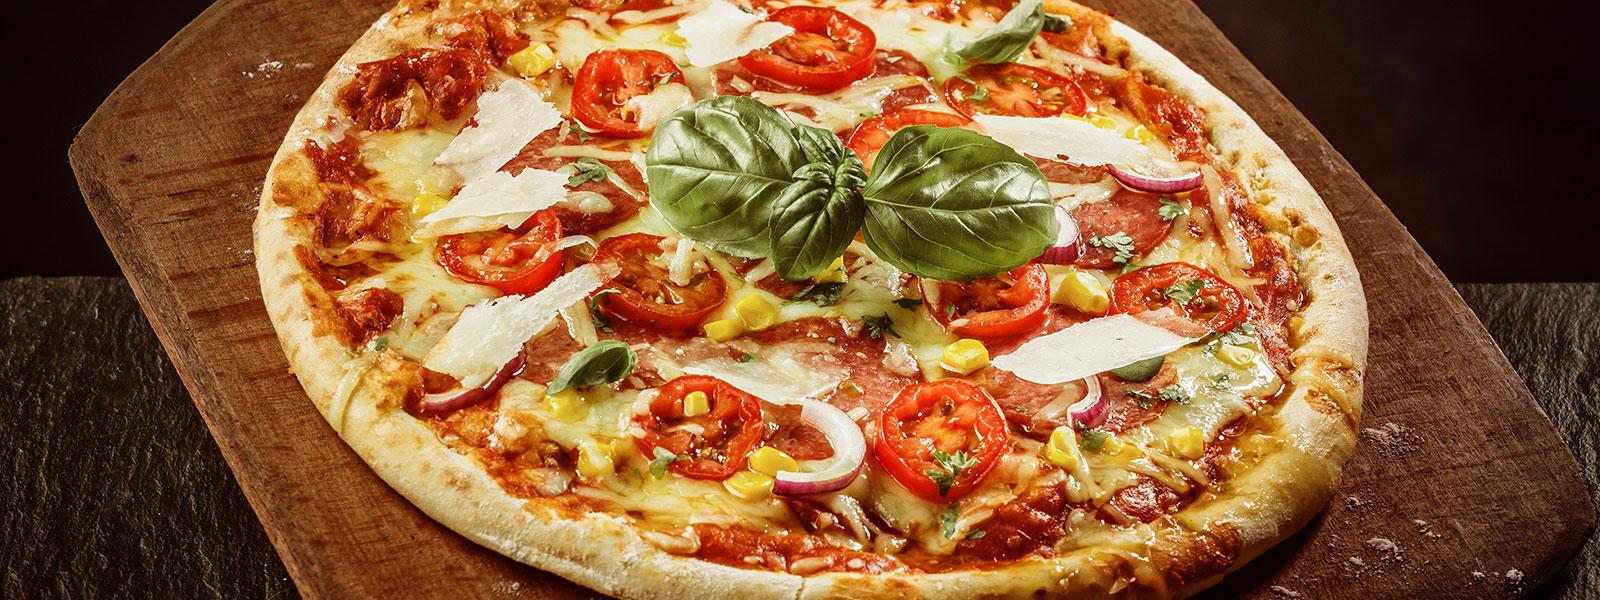 manhattan pizza sunderland just eat